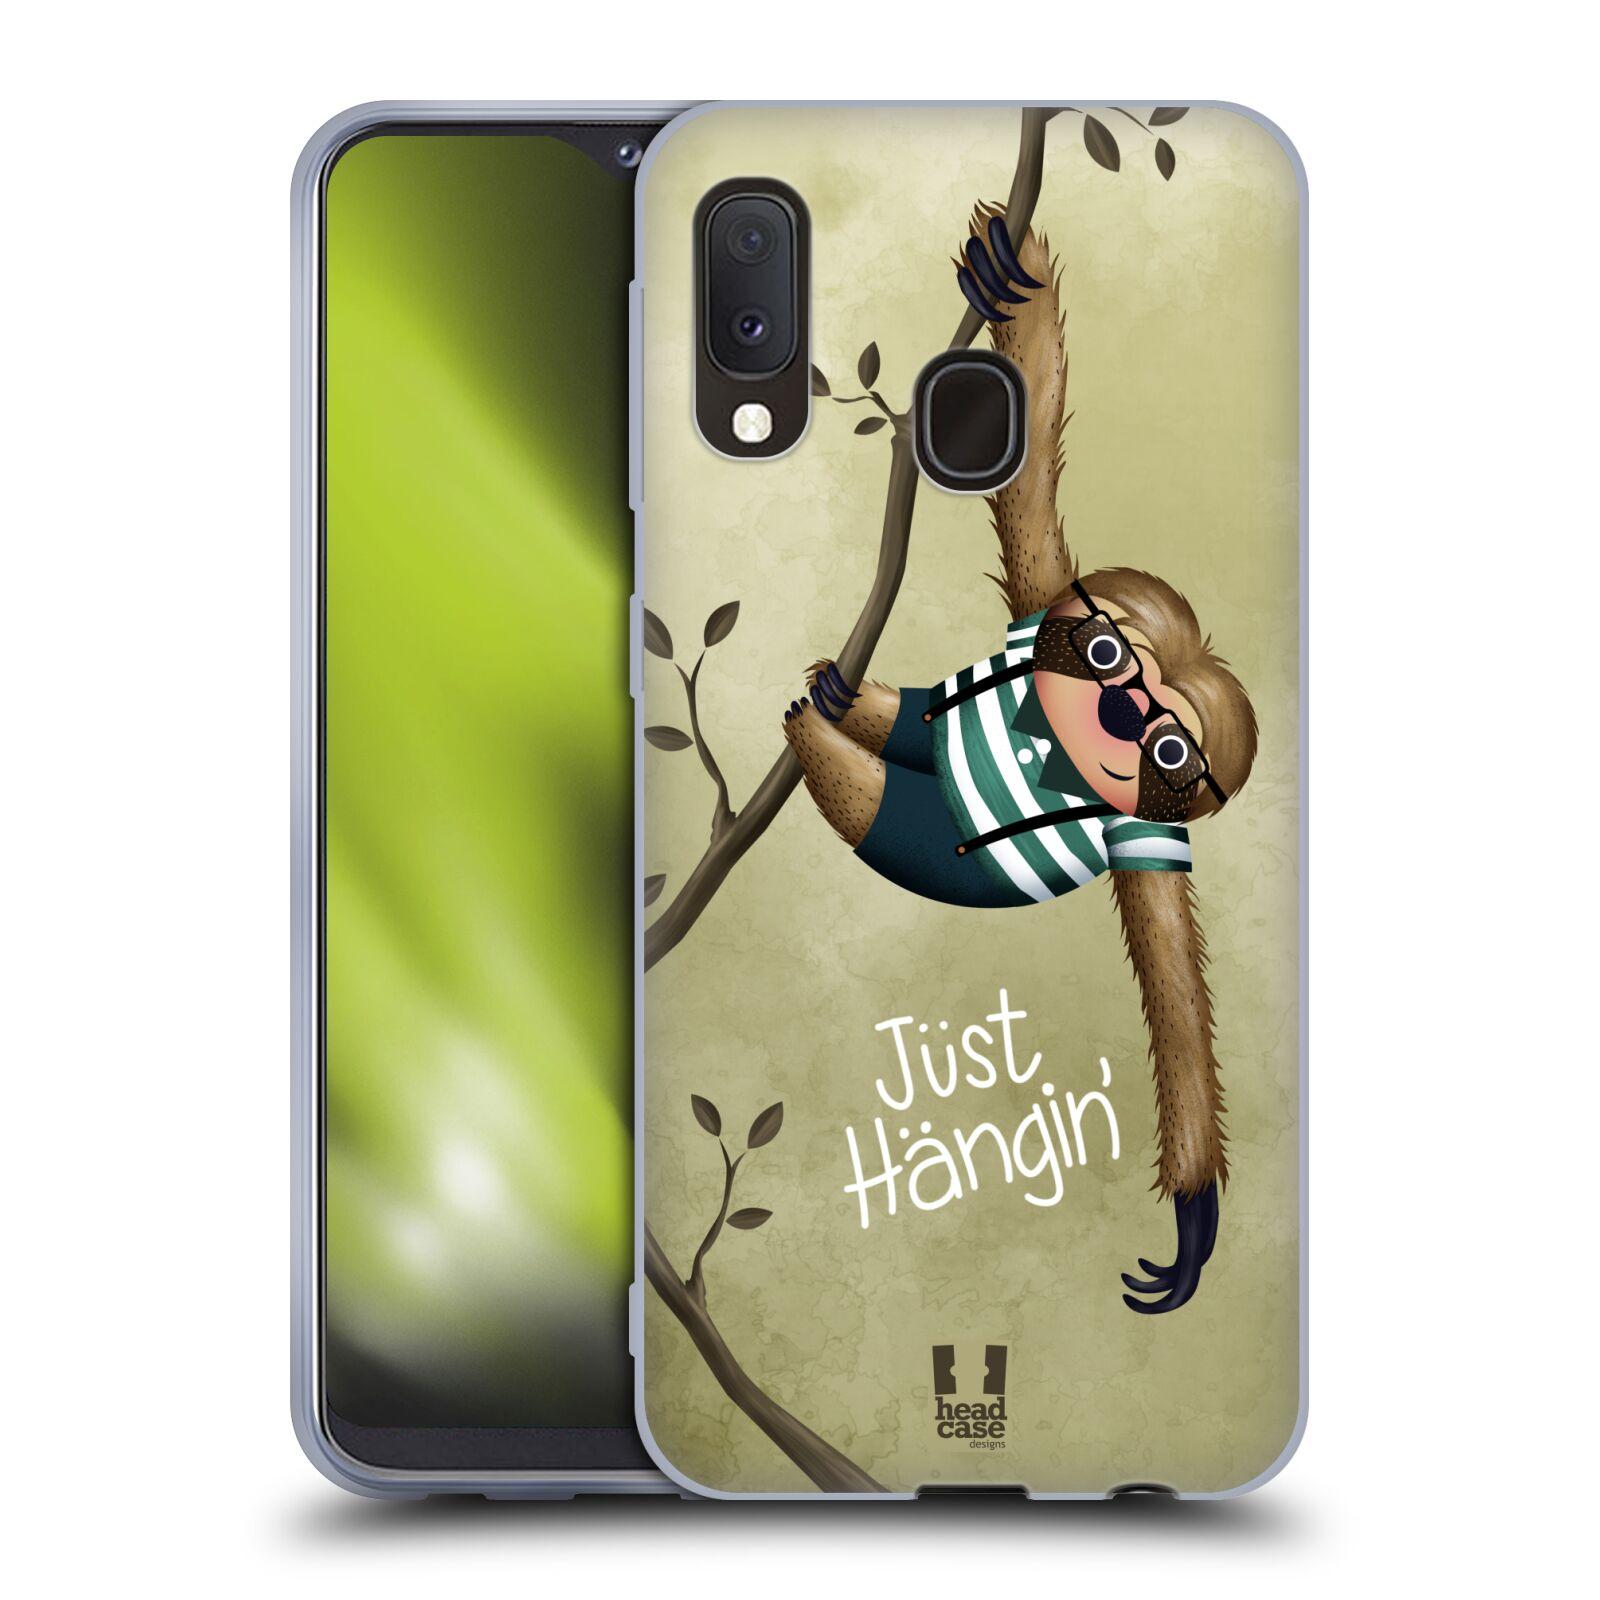 Silikonové pouzdro na mobil Samsung Galaxy A20e - Head Case - Lenochod Just Hangin